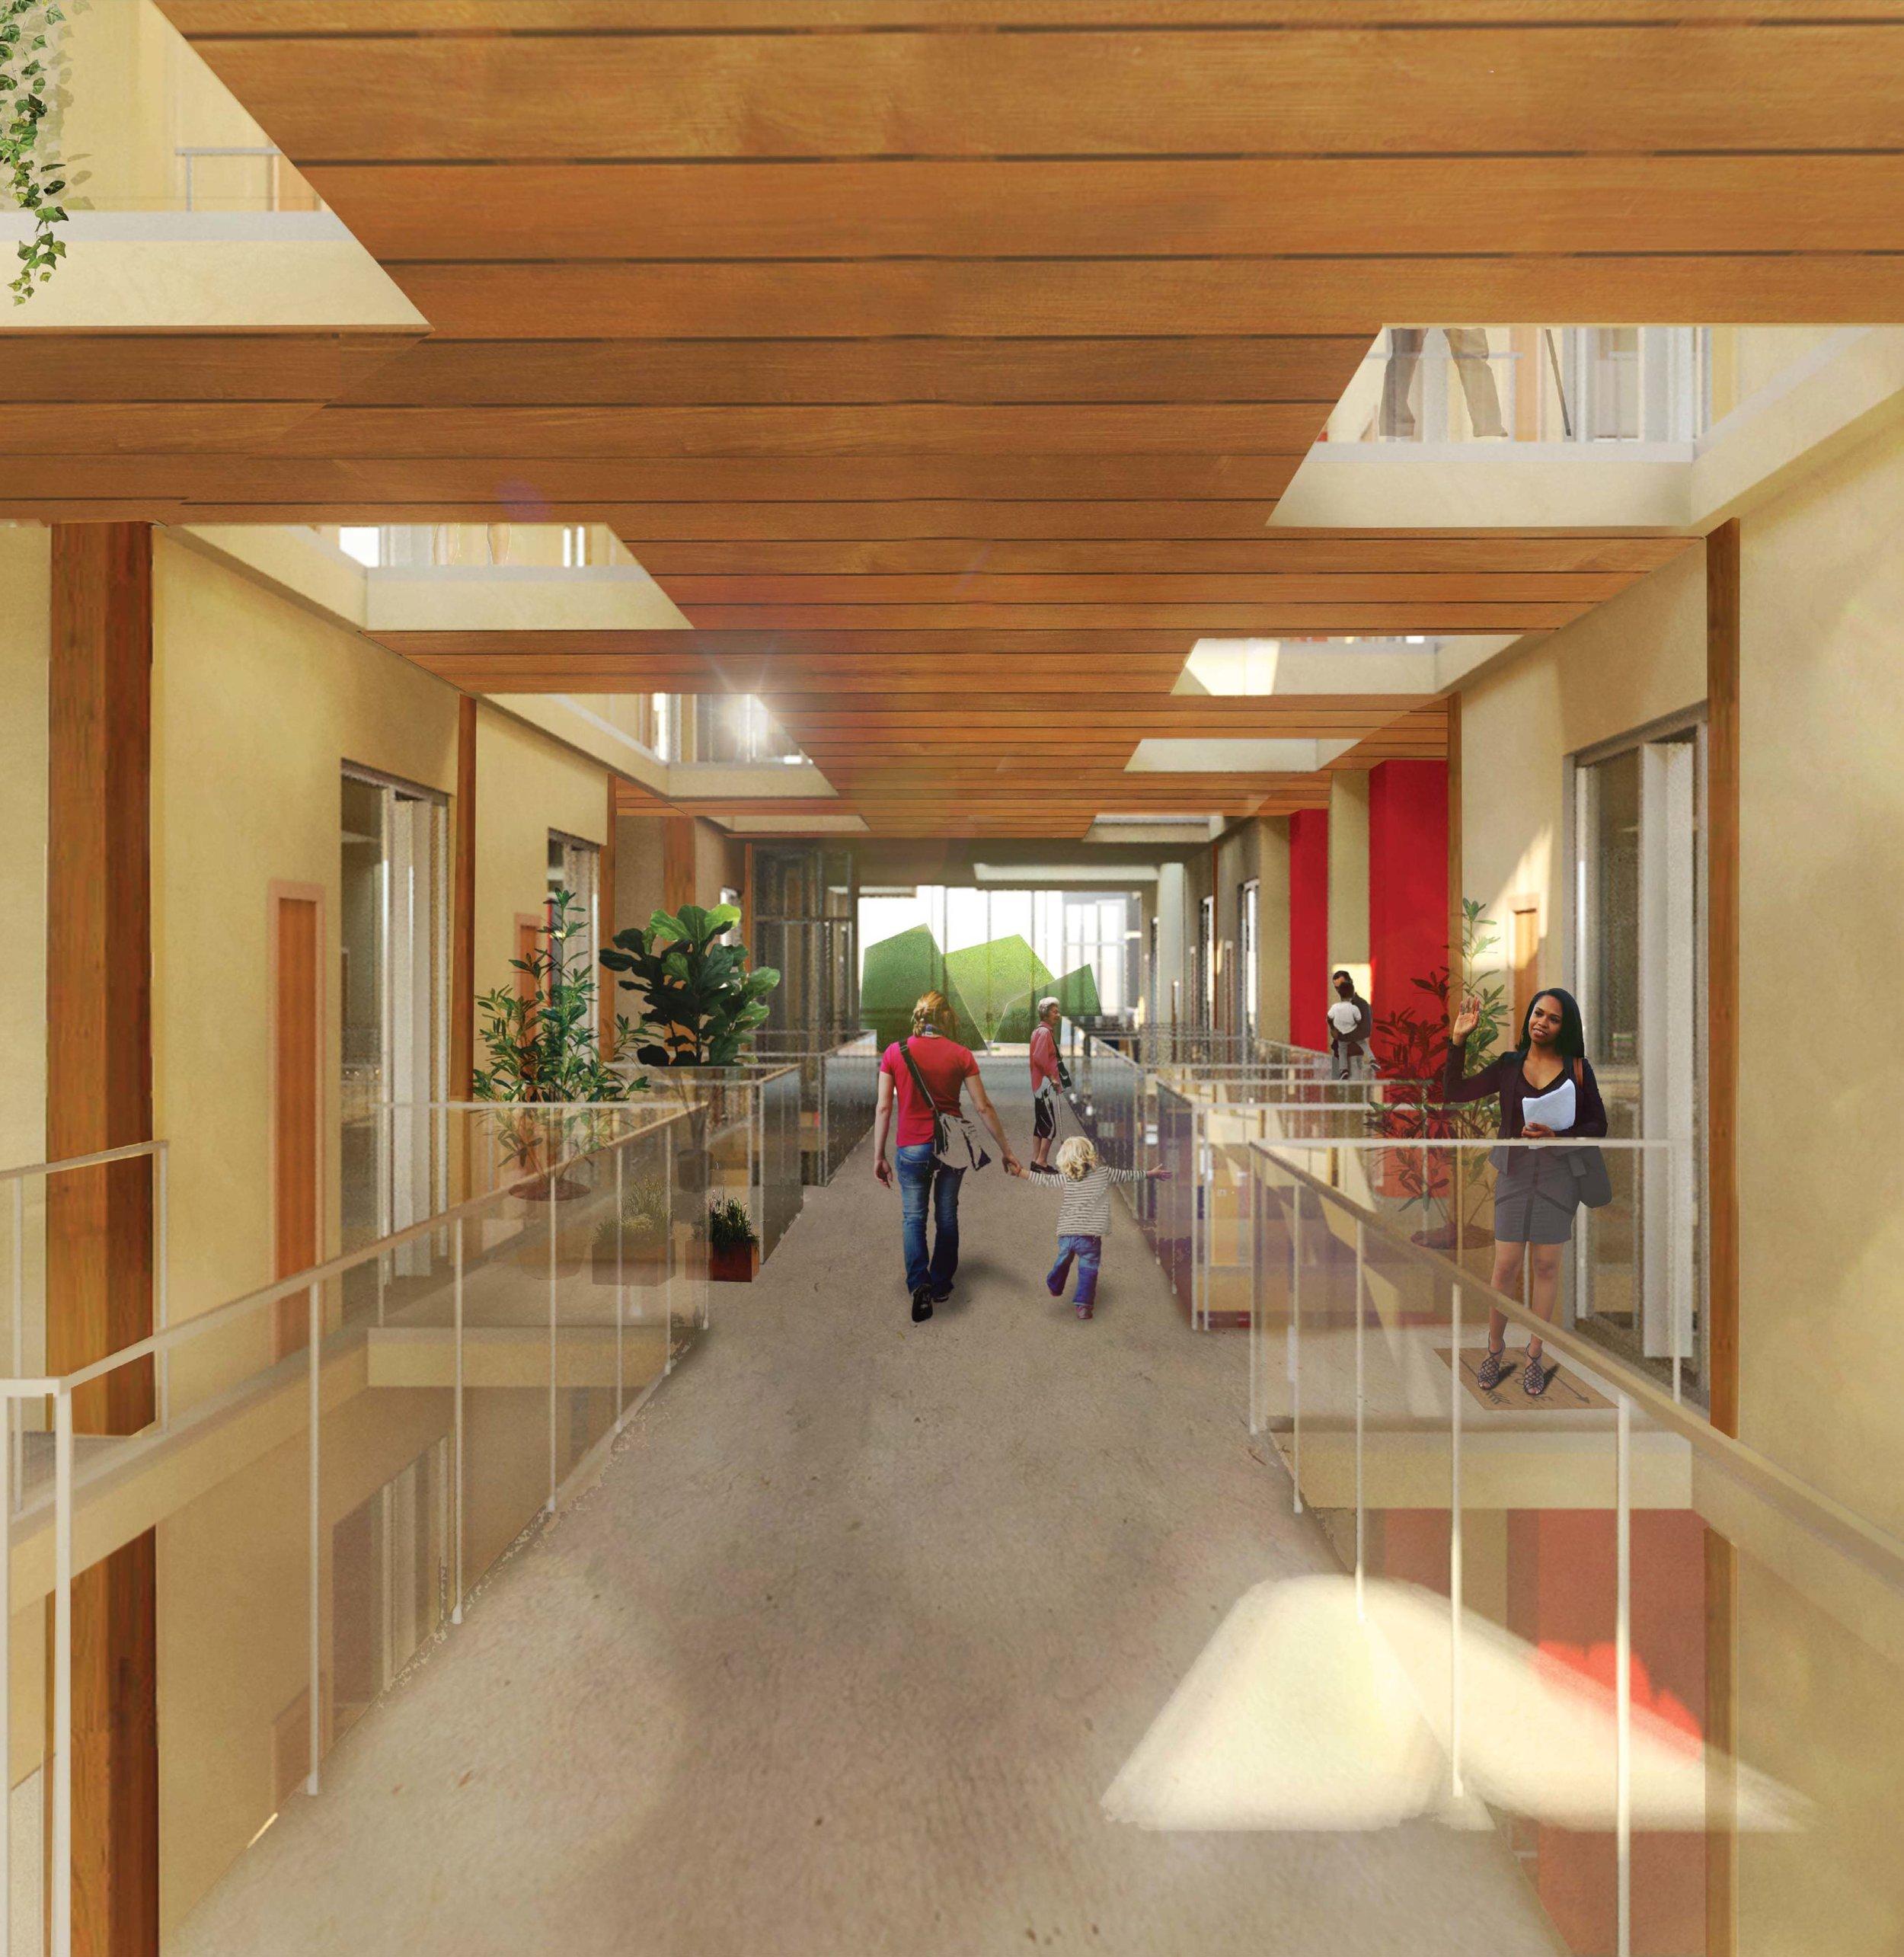 inner-hallway.jpg